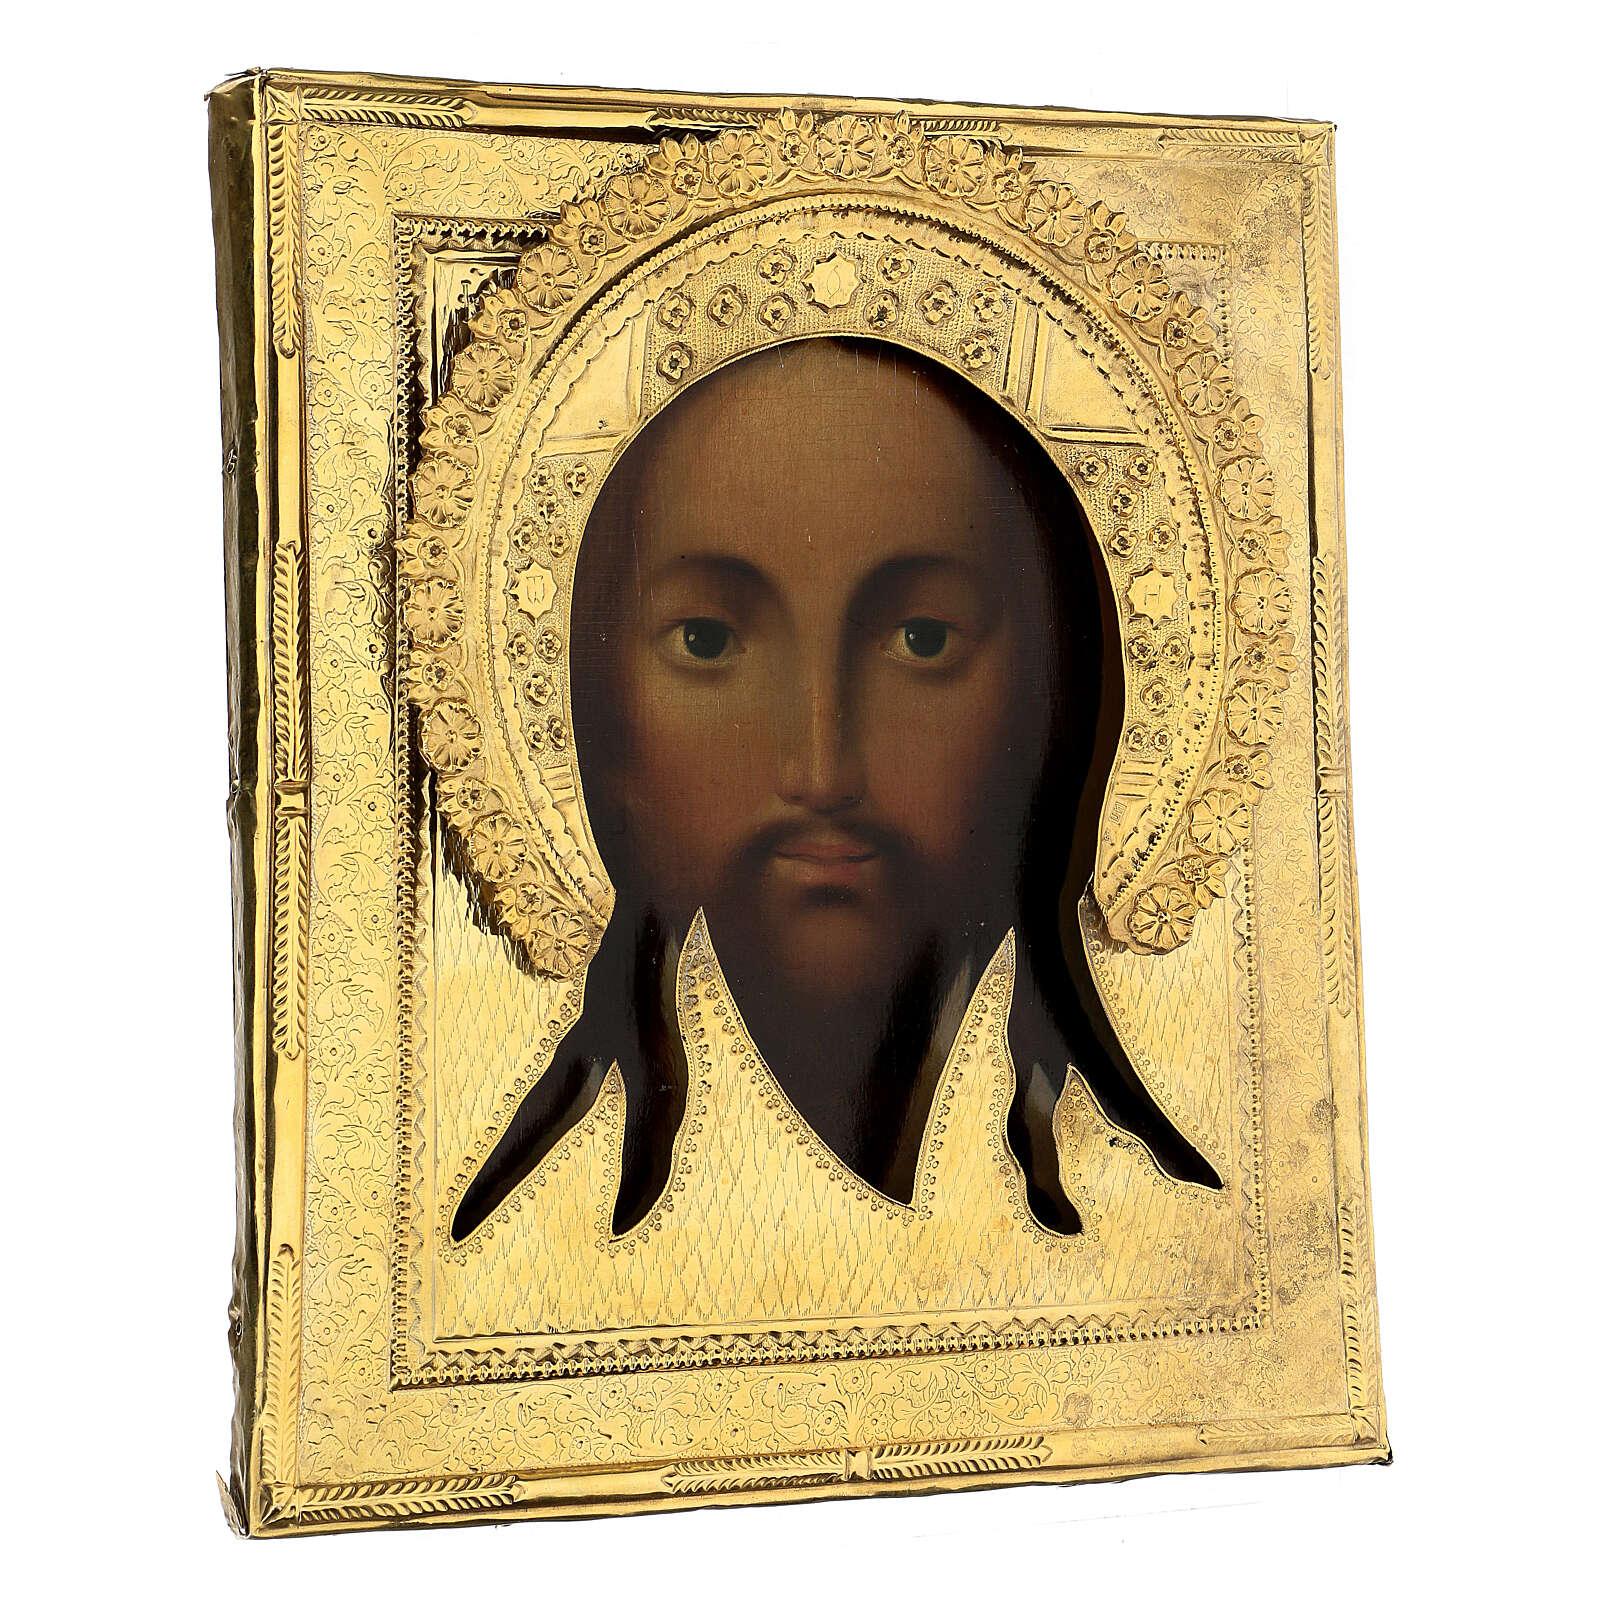 Acheiropoieta antique Russian icon 1872, Holy Face with riza 84 zolot, 32x28 cm 4